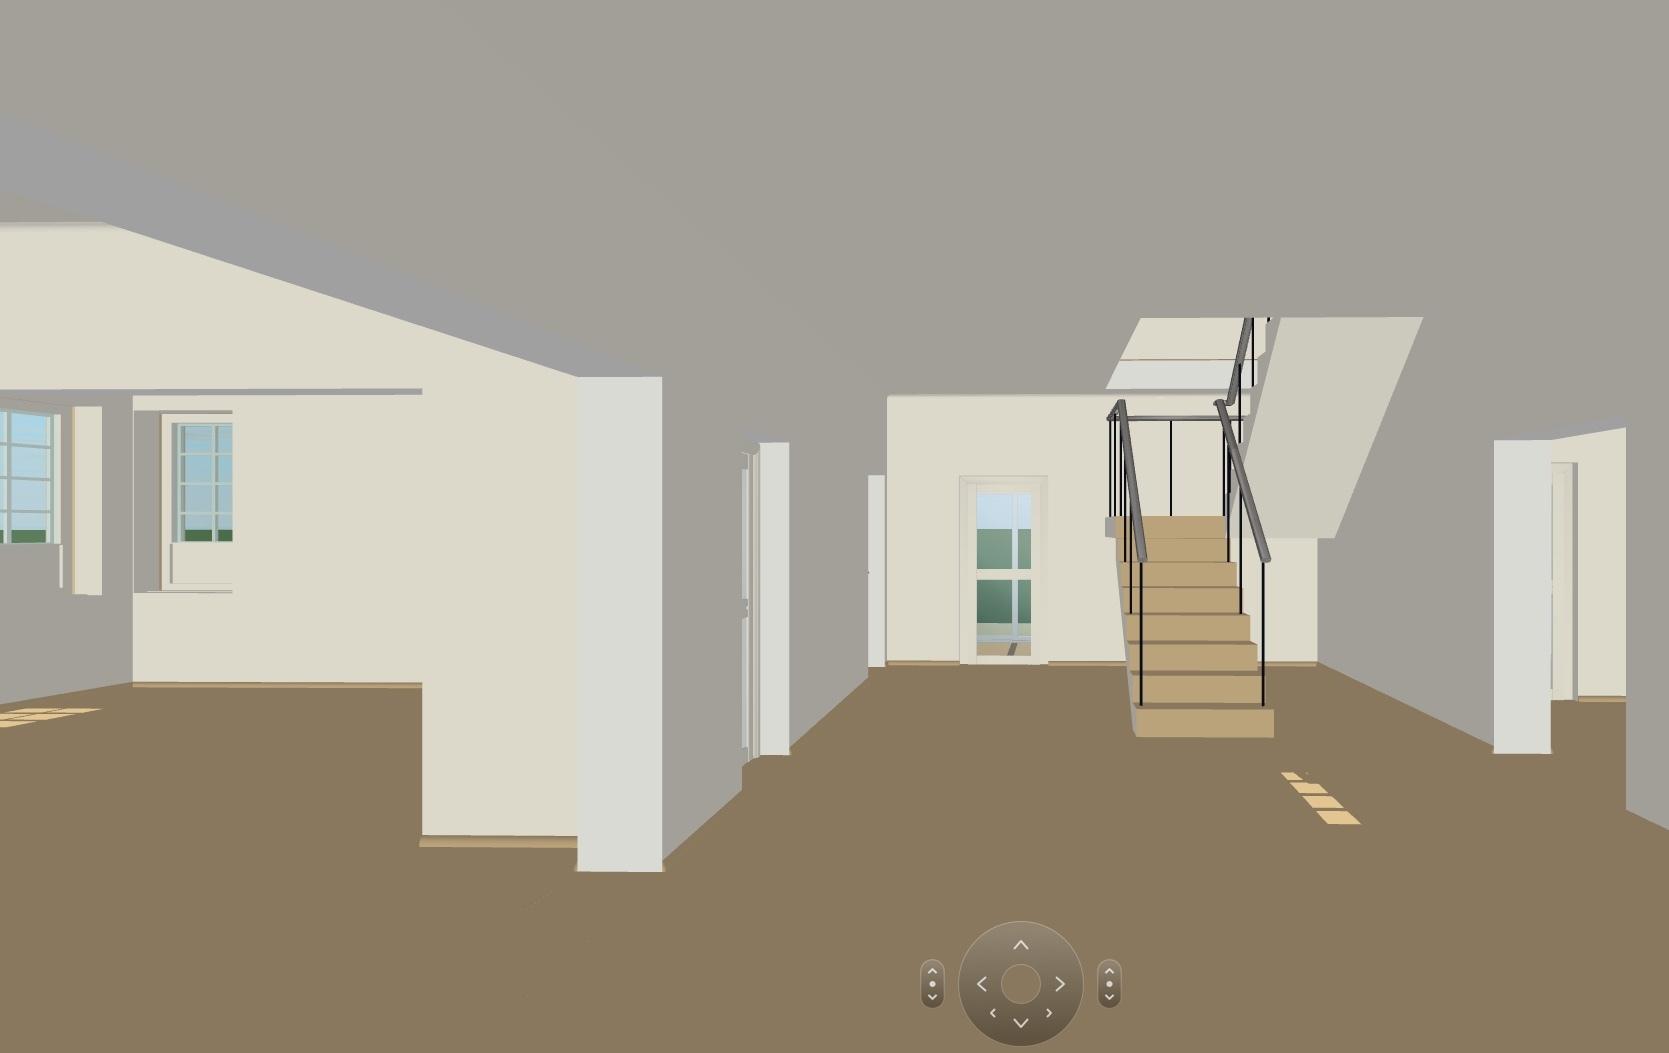 Виртуальная прогулка по будущему дому